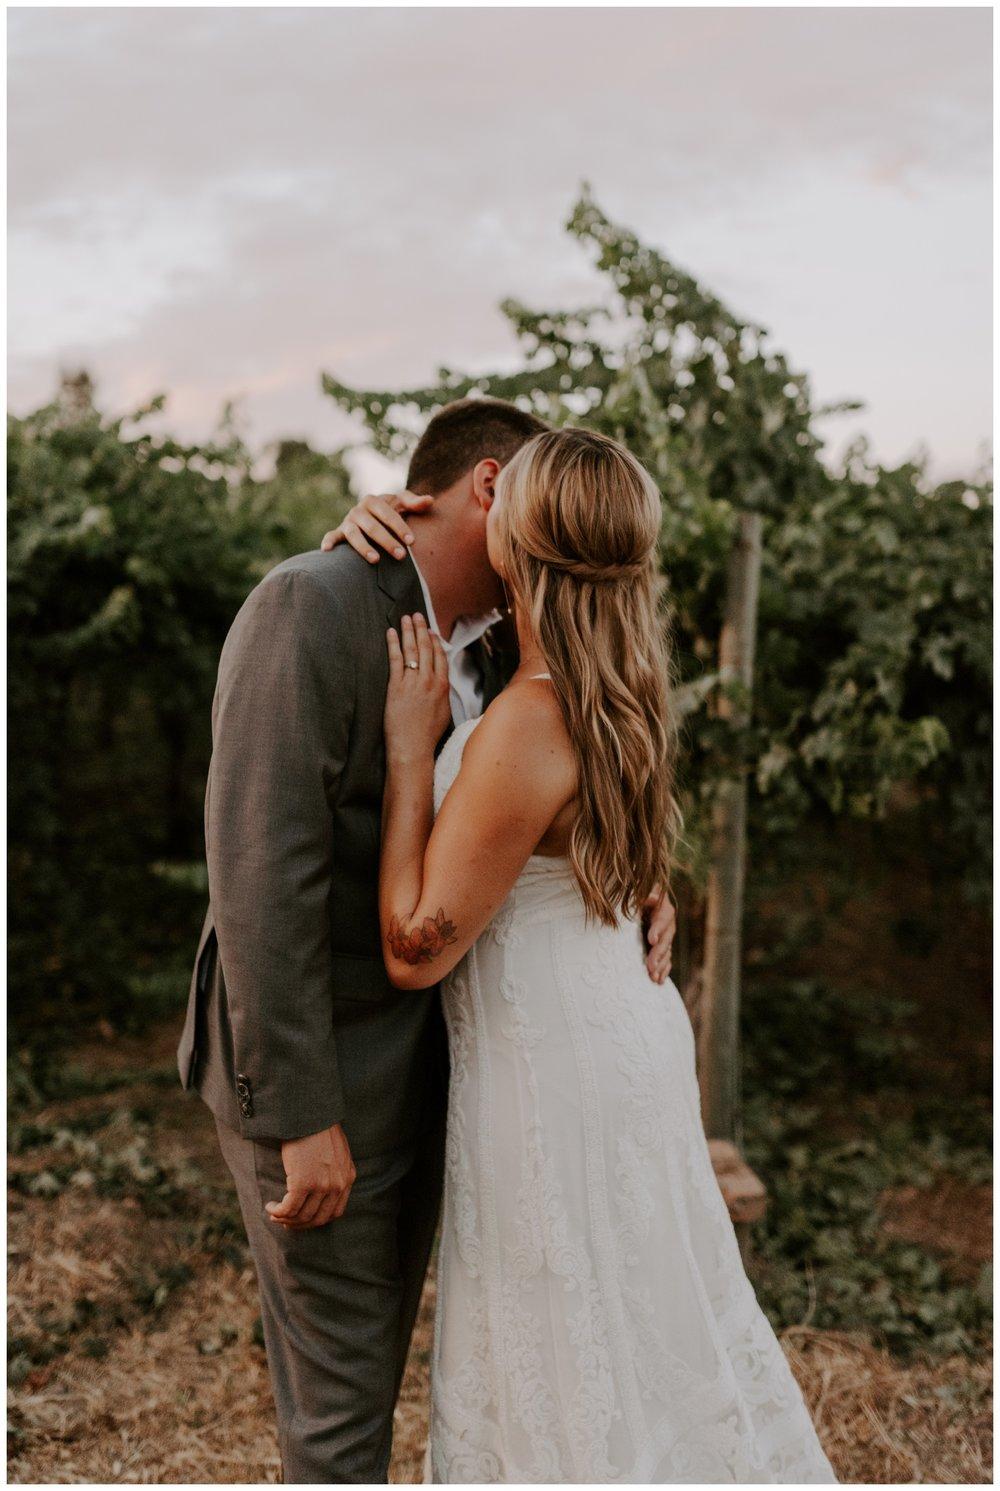 Napa Valley Backyard Wedding and Reception at Elizabeth Spencer Winery | Jessica Heron Images 197.jpg